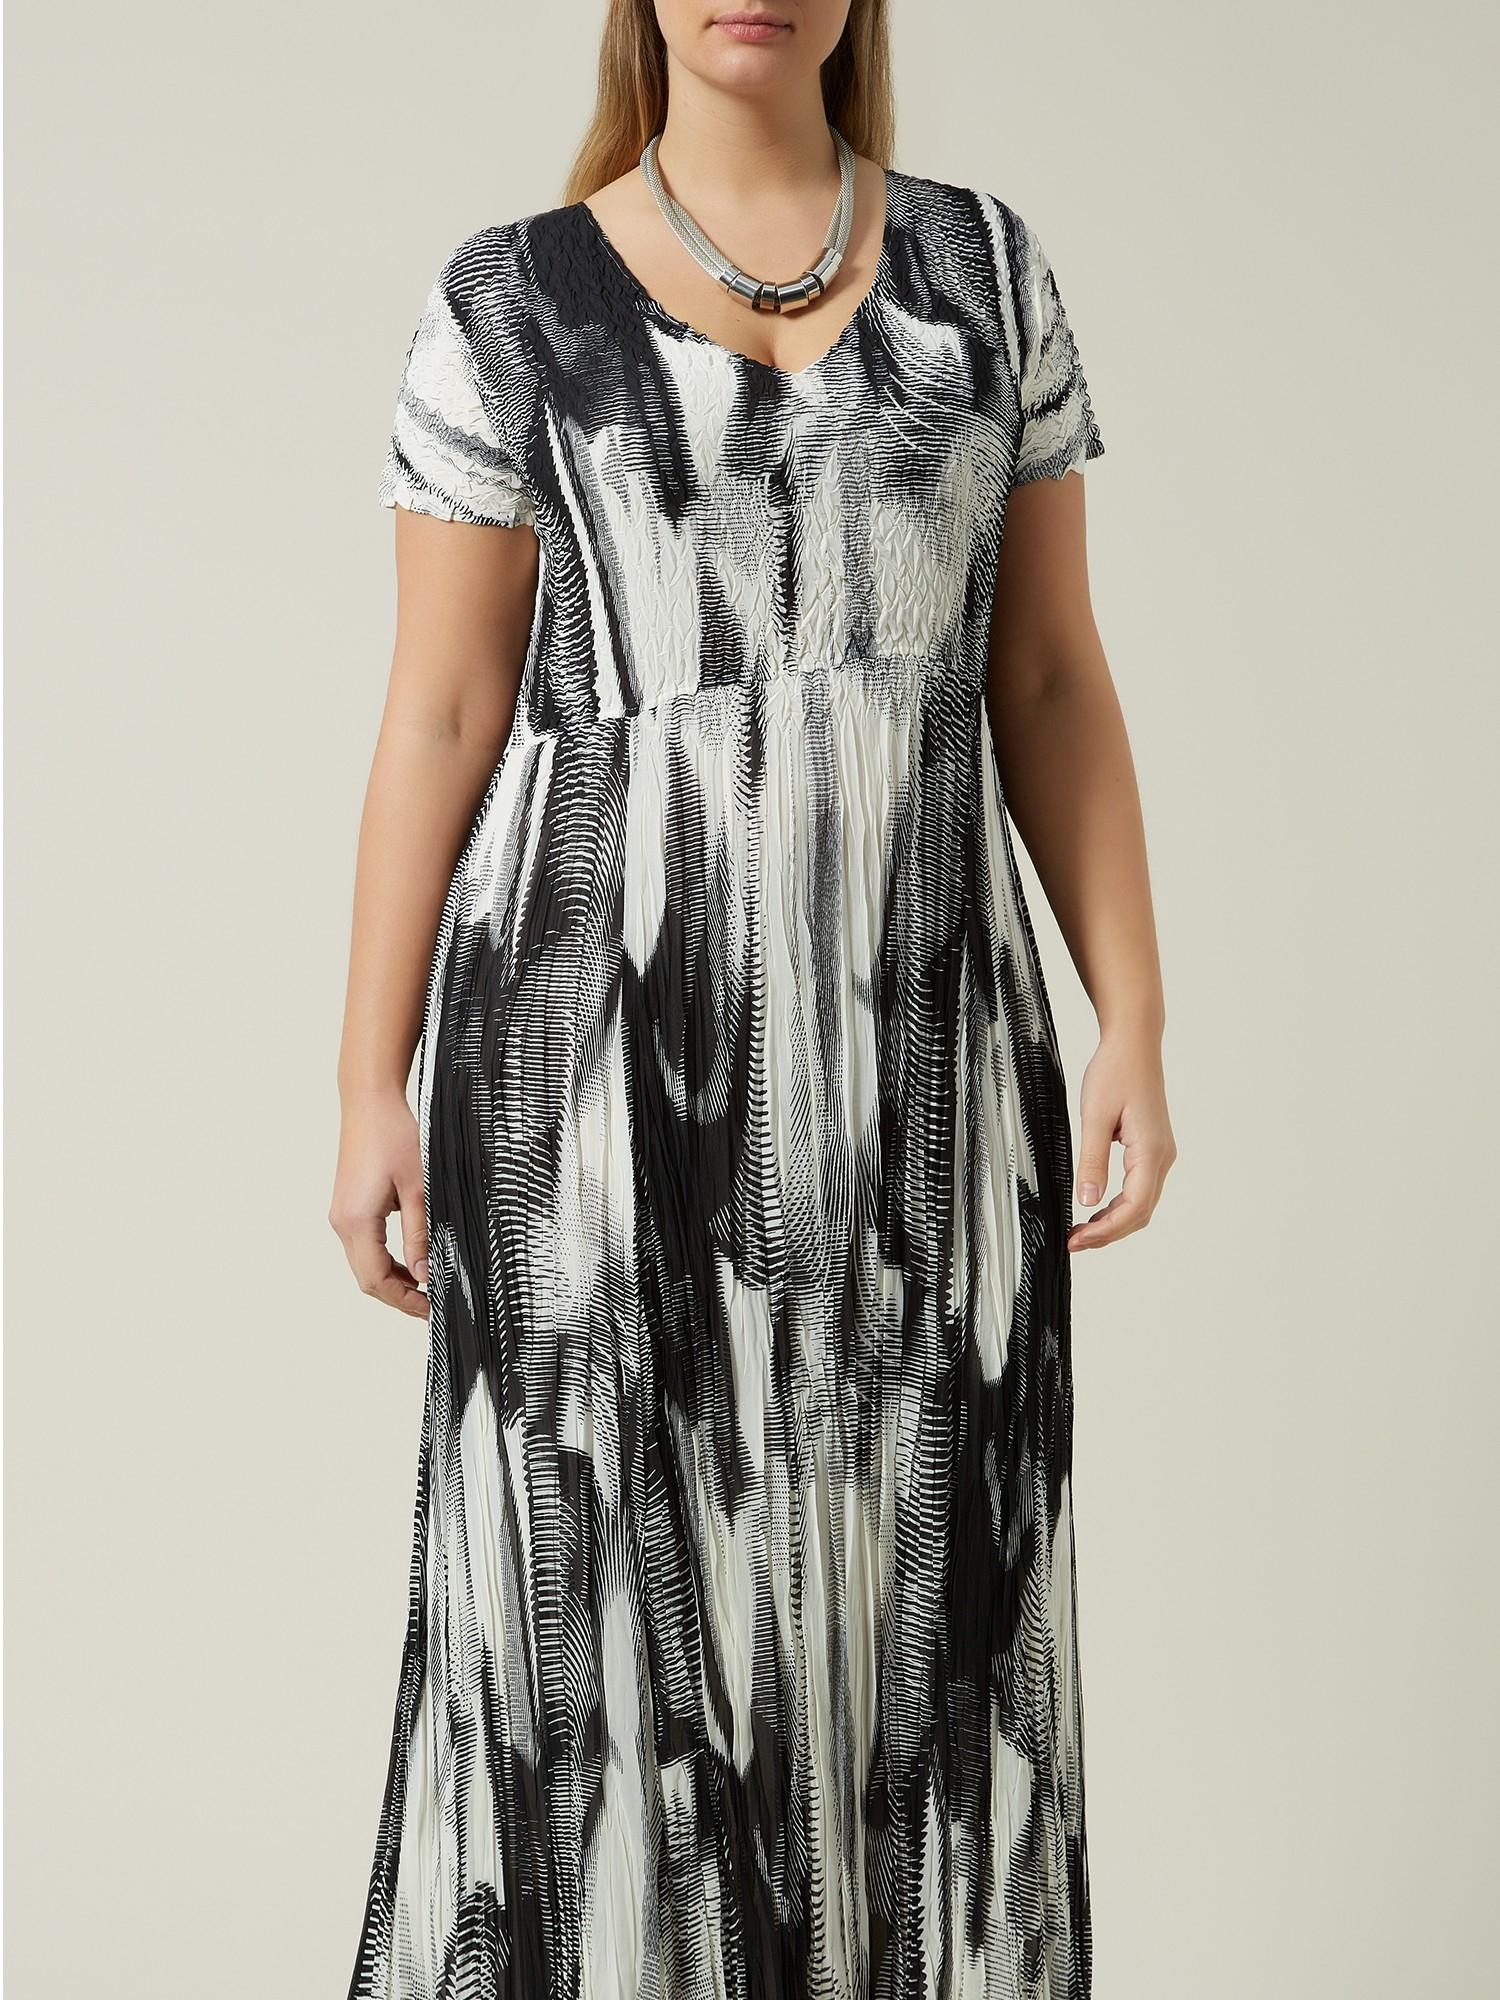 Windsmoor Crinkle Dress In White Lyst